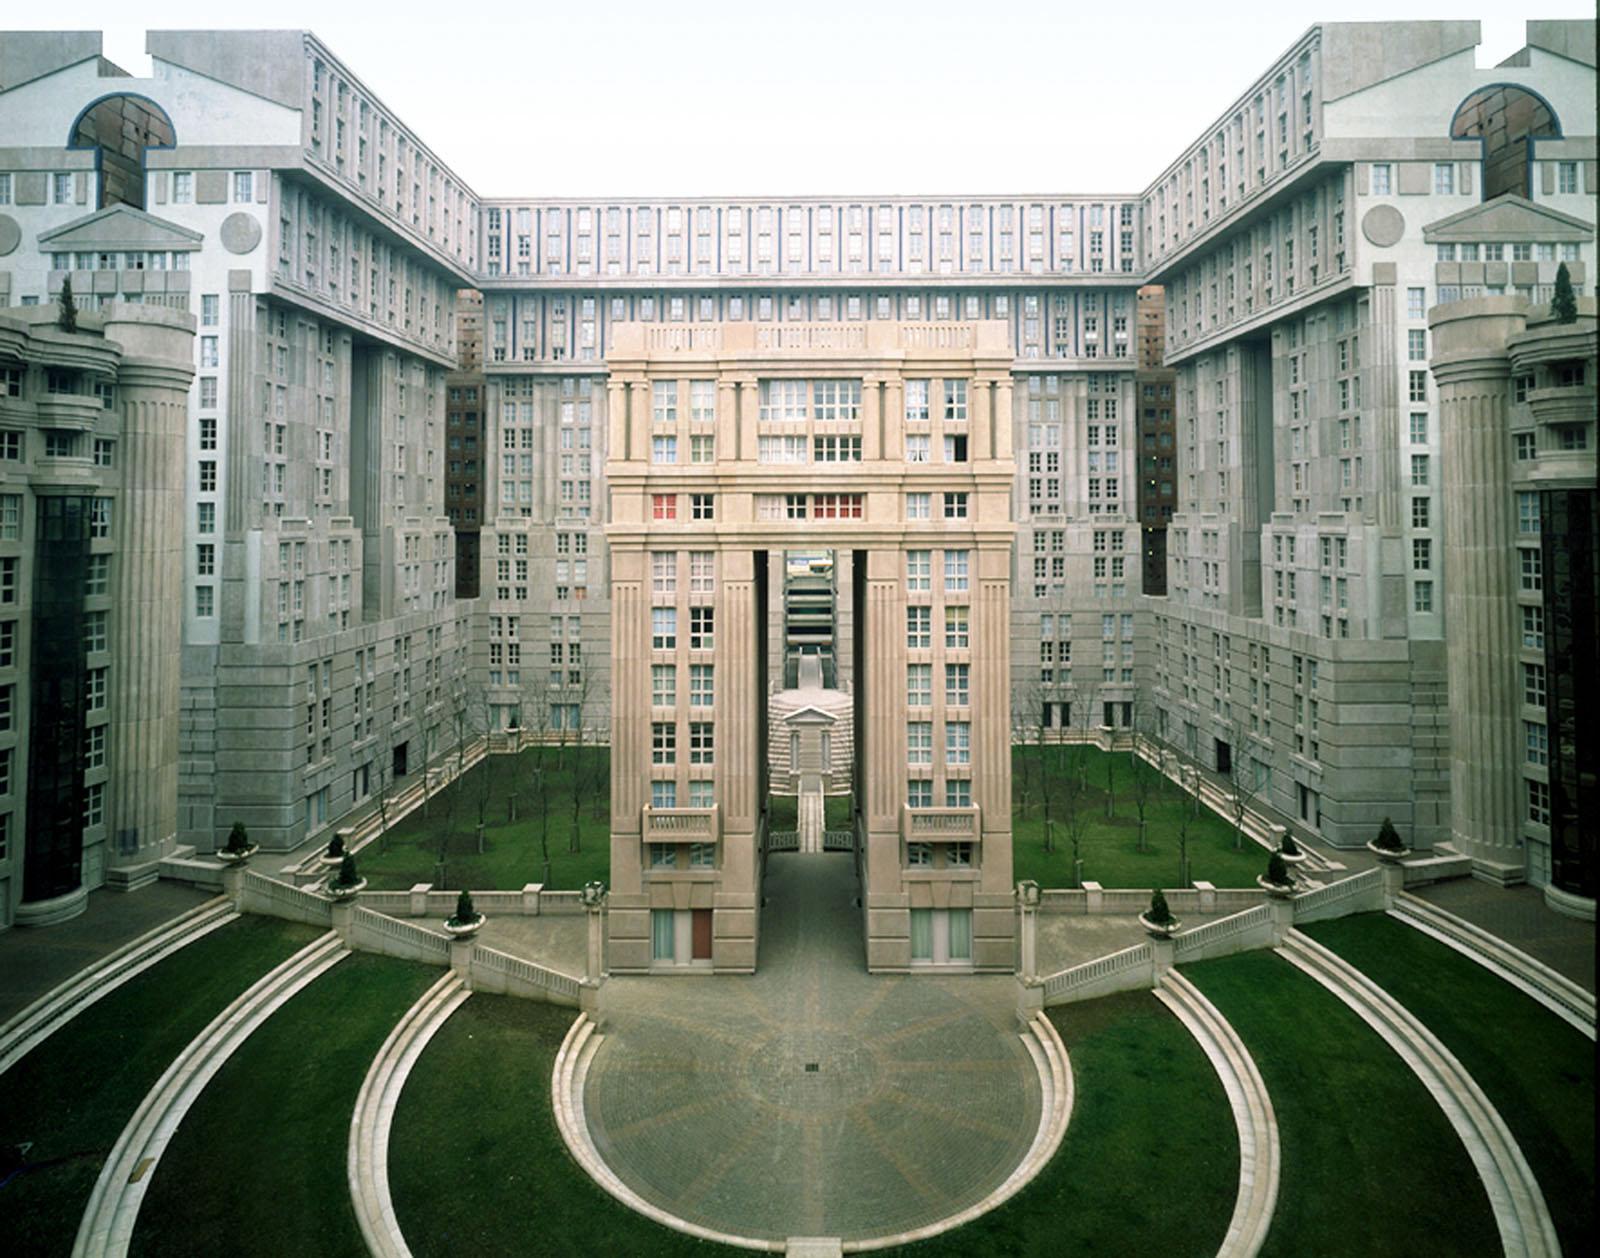 Postmodern Neoclassical Housing Estate A Theoretical Utopia